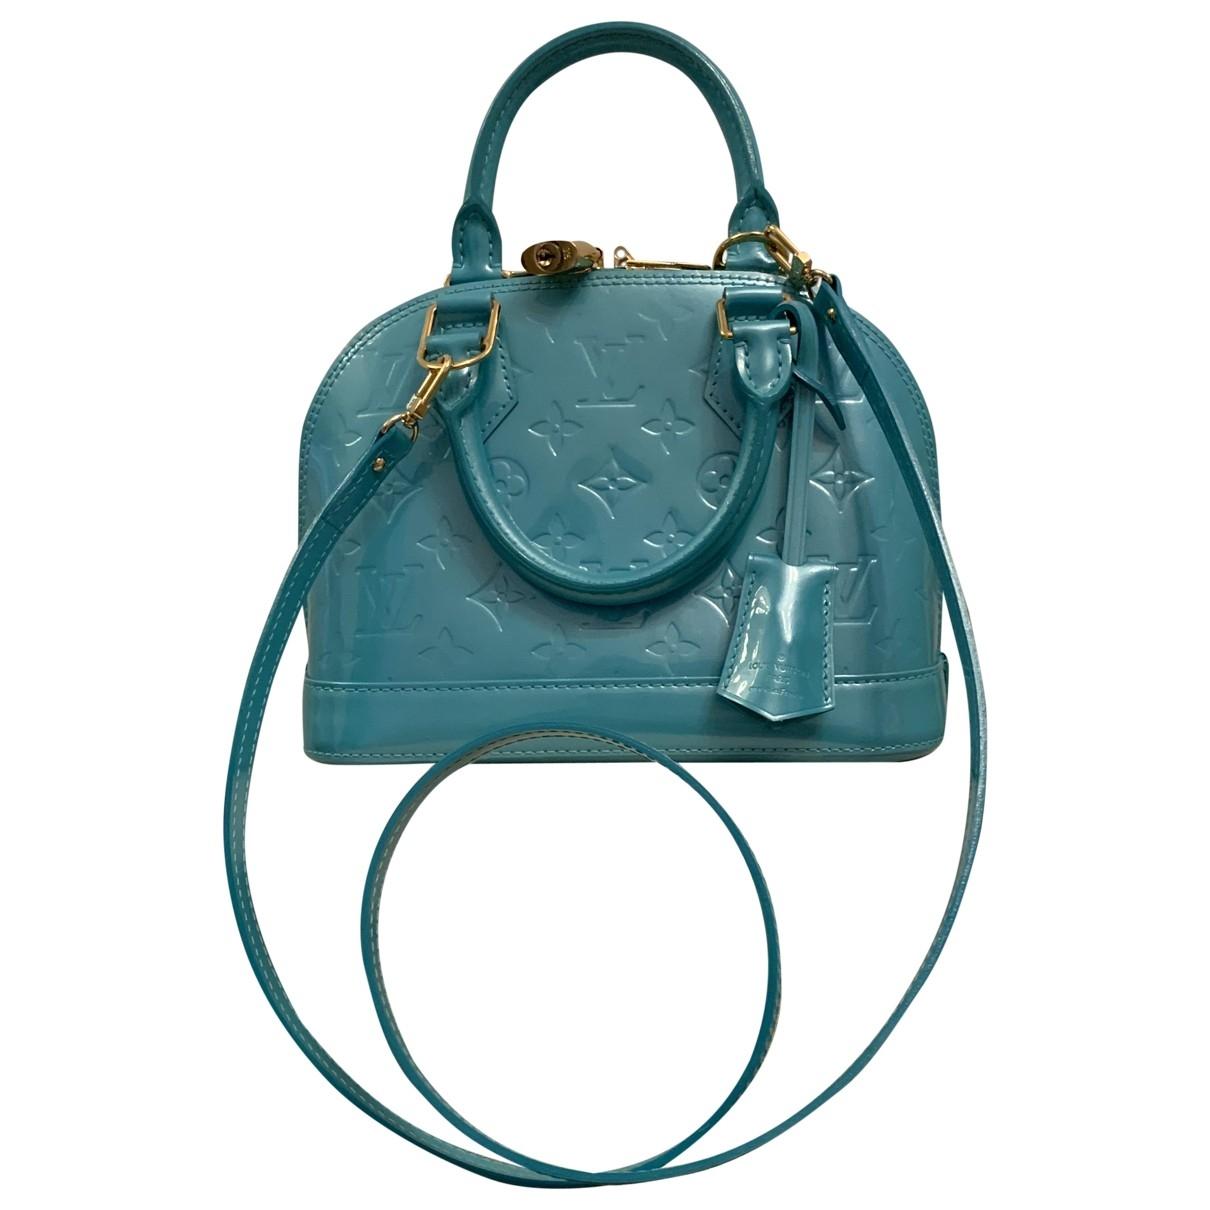 Louis Vuitton Alma BB Turquoise Patent leather handbag for Women \N